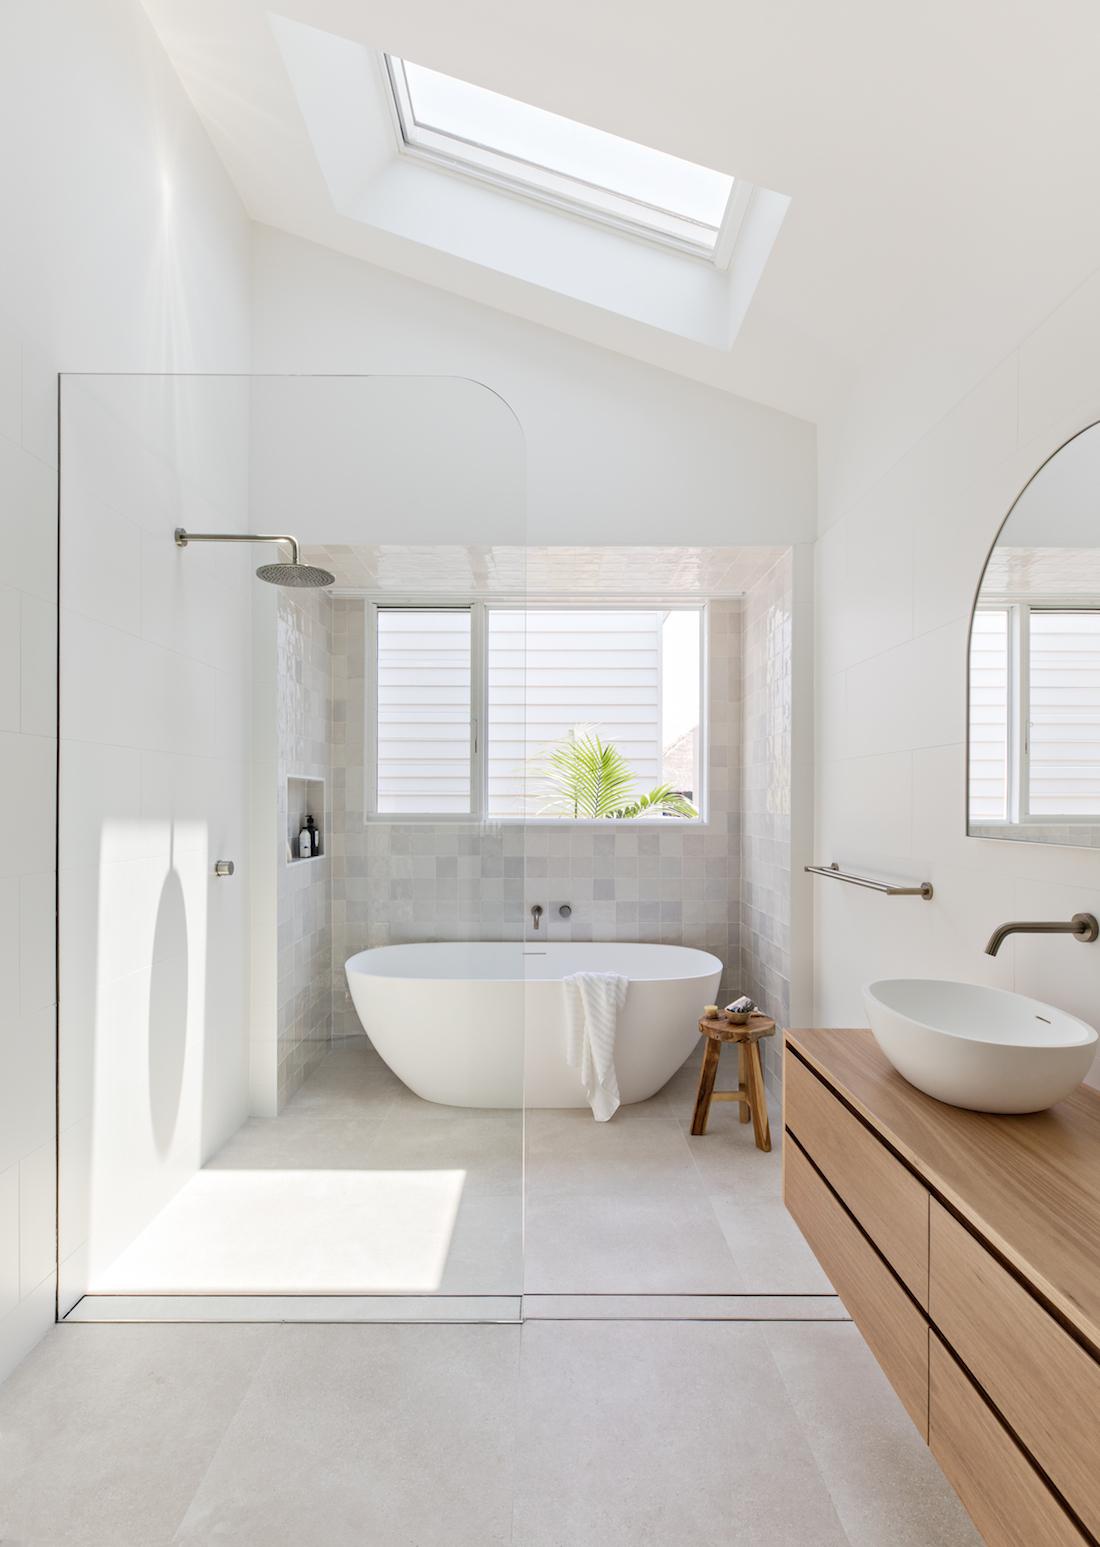 Orton Haus bathroom with freestanding bath